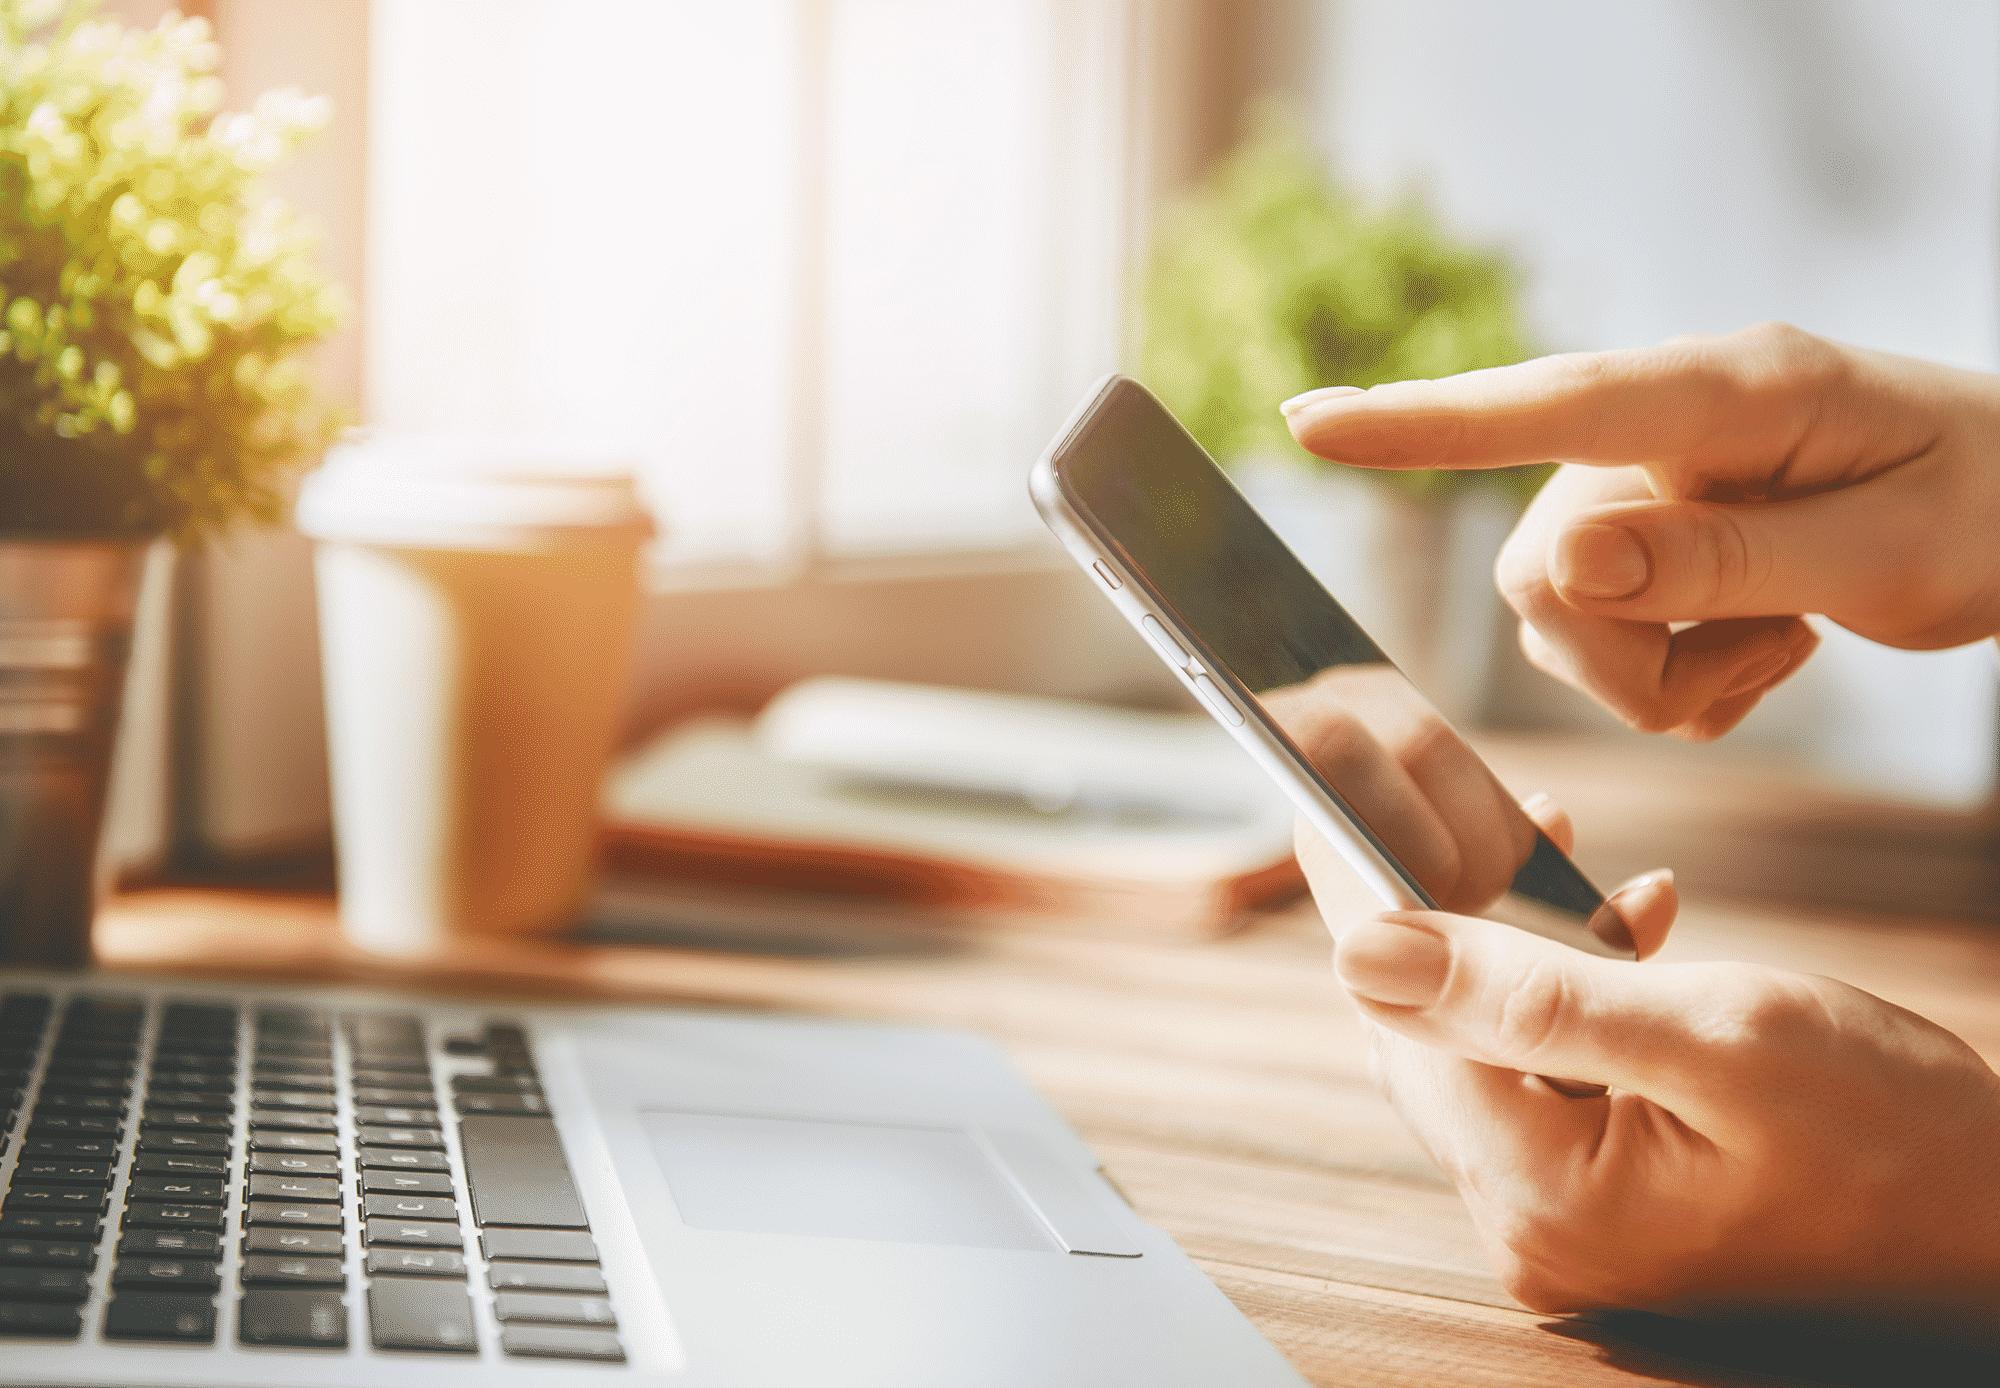 checking stocks on smartphone